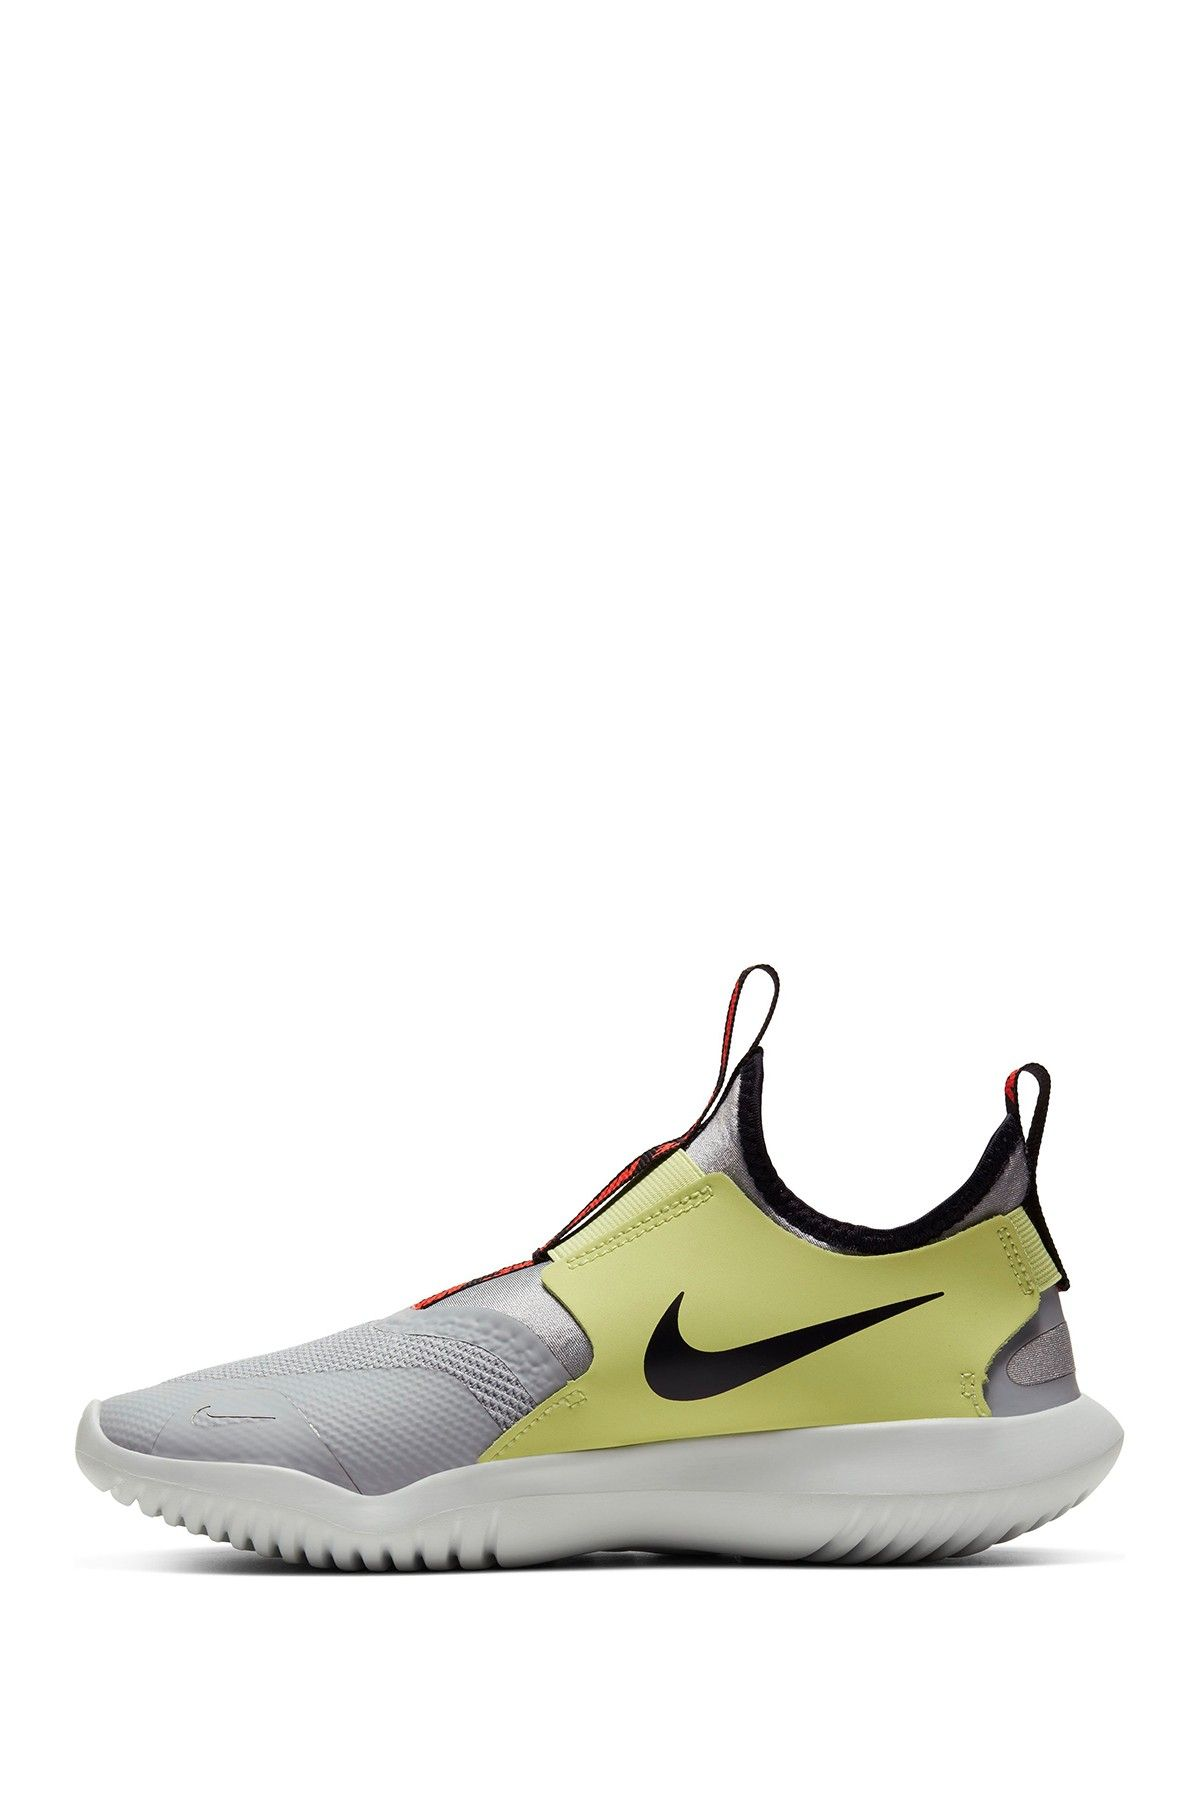 Nike | Future Flex GS Sneaker